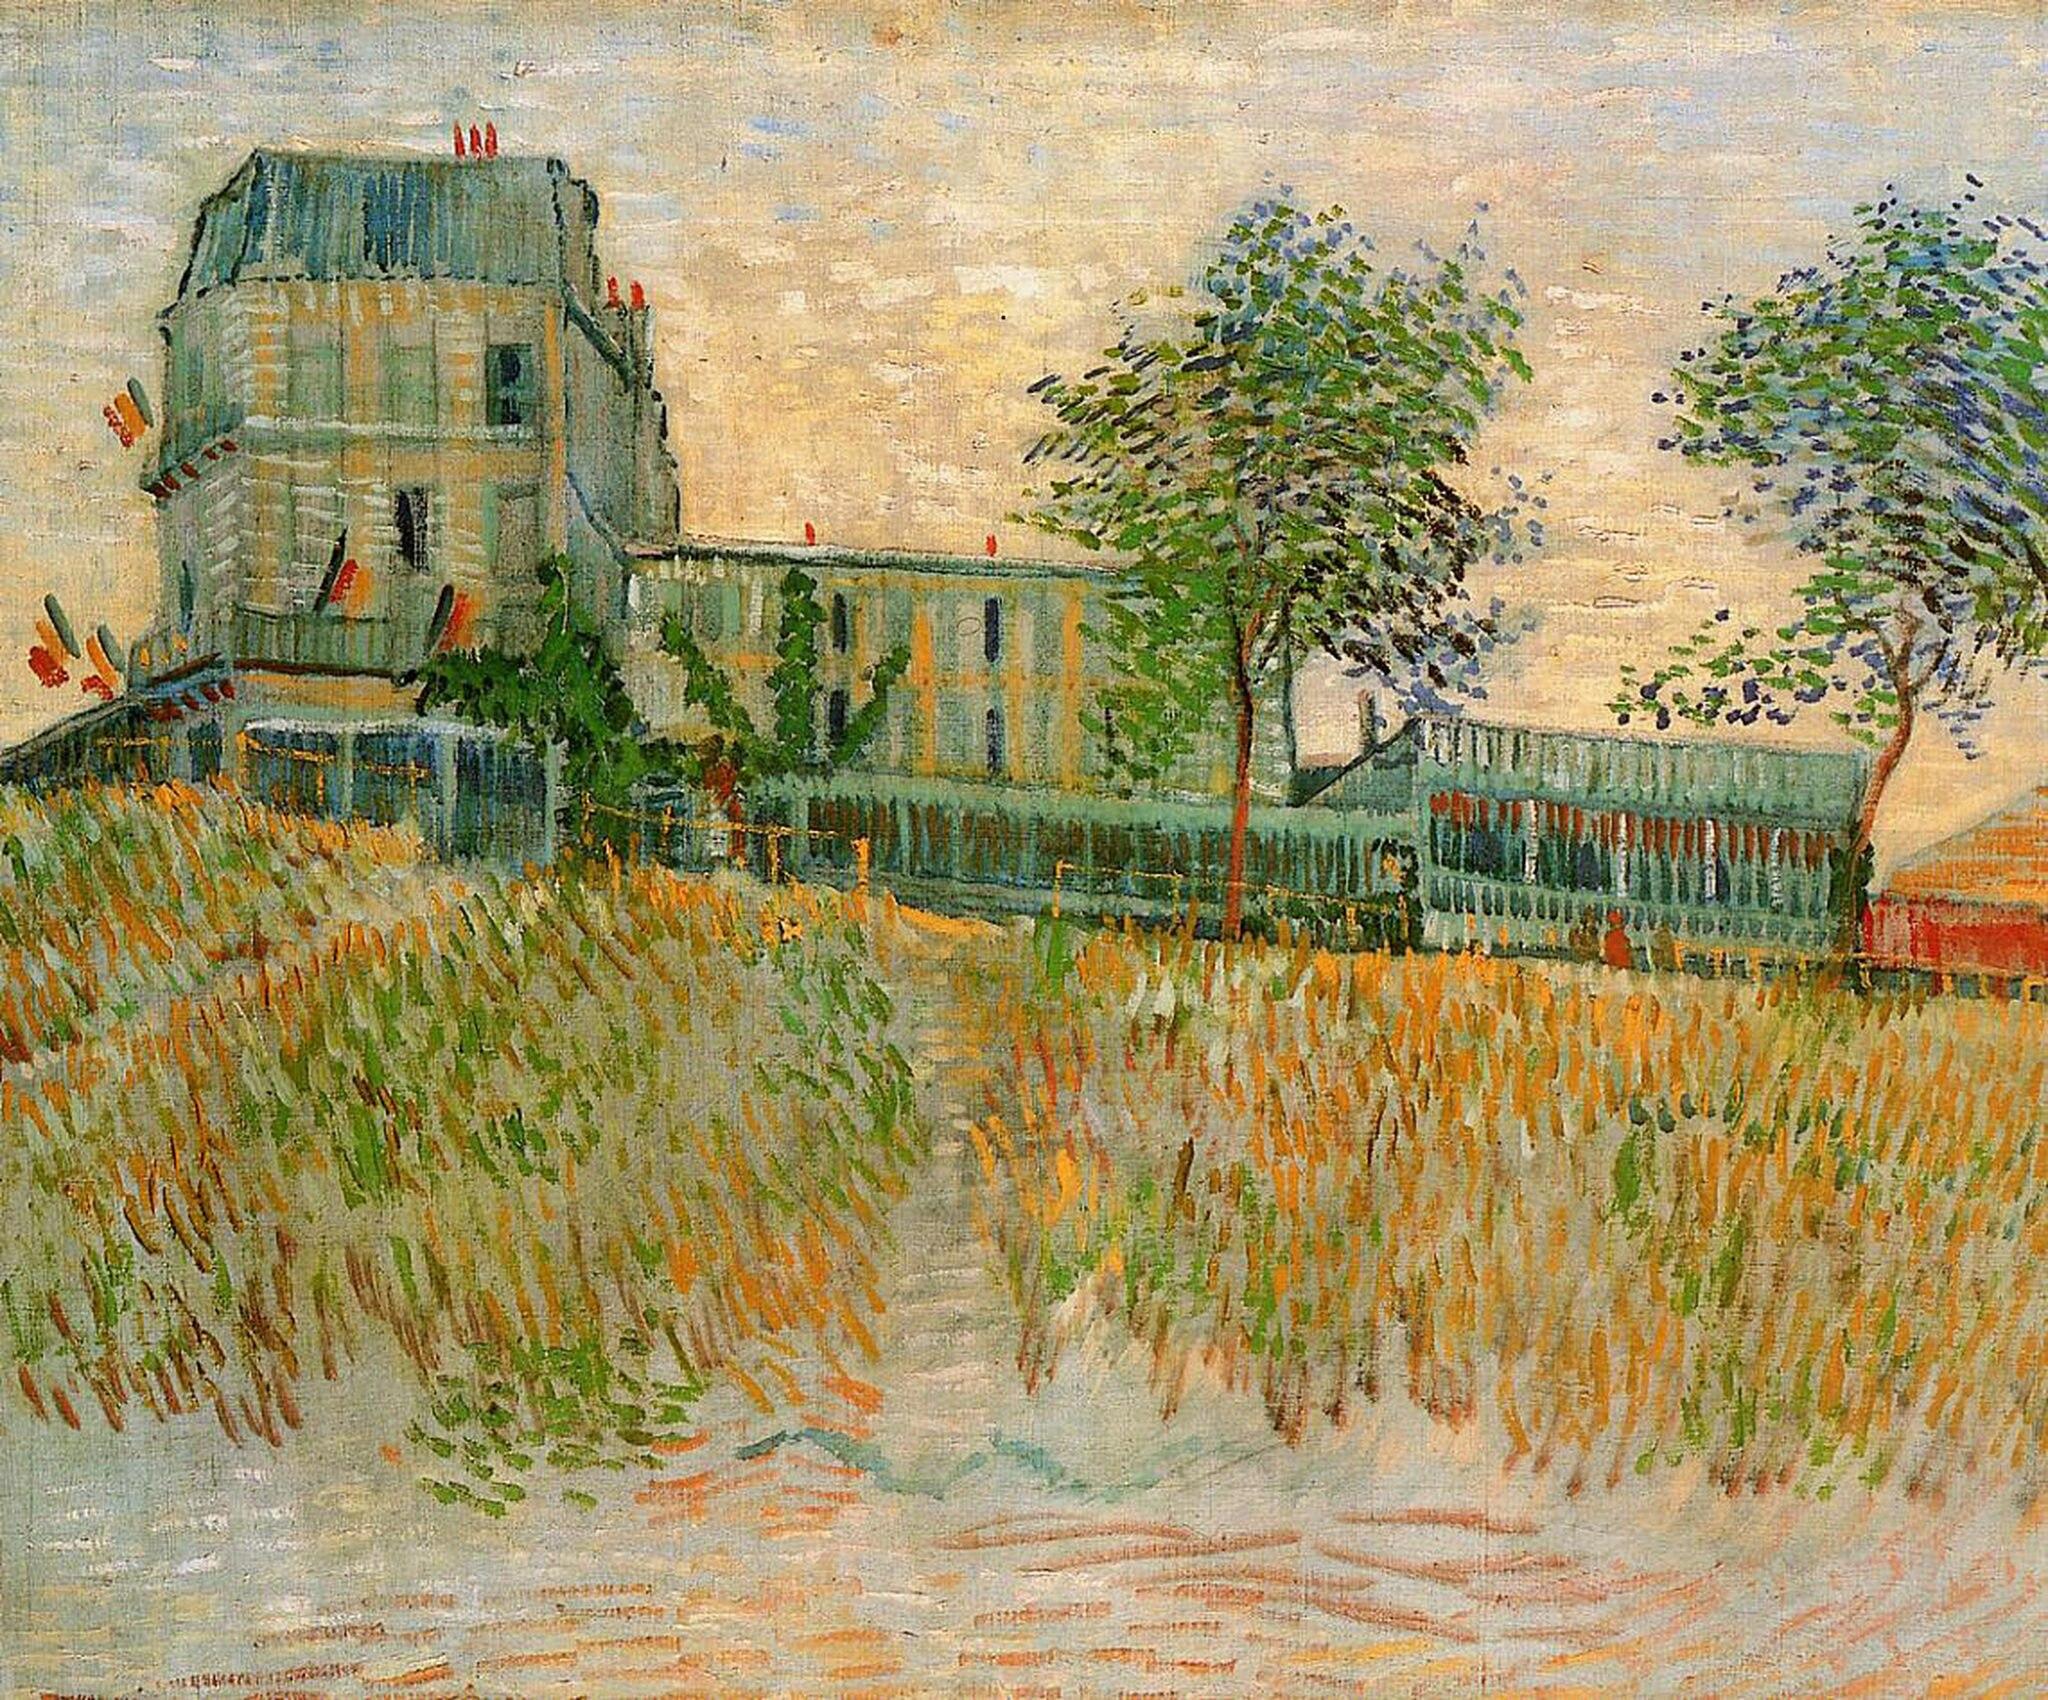 Ресторан Сирена в Аснирес [ картина - пейзаж ] :: Ван Гог, описание картины - Van Gogh (Ван Гог) фото